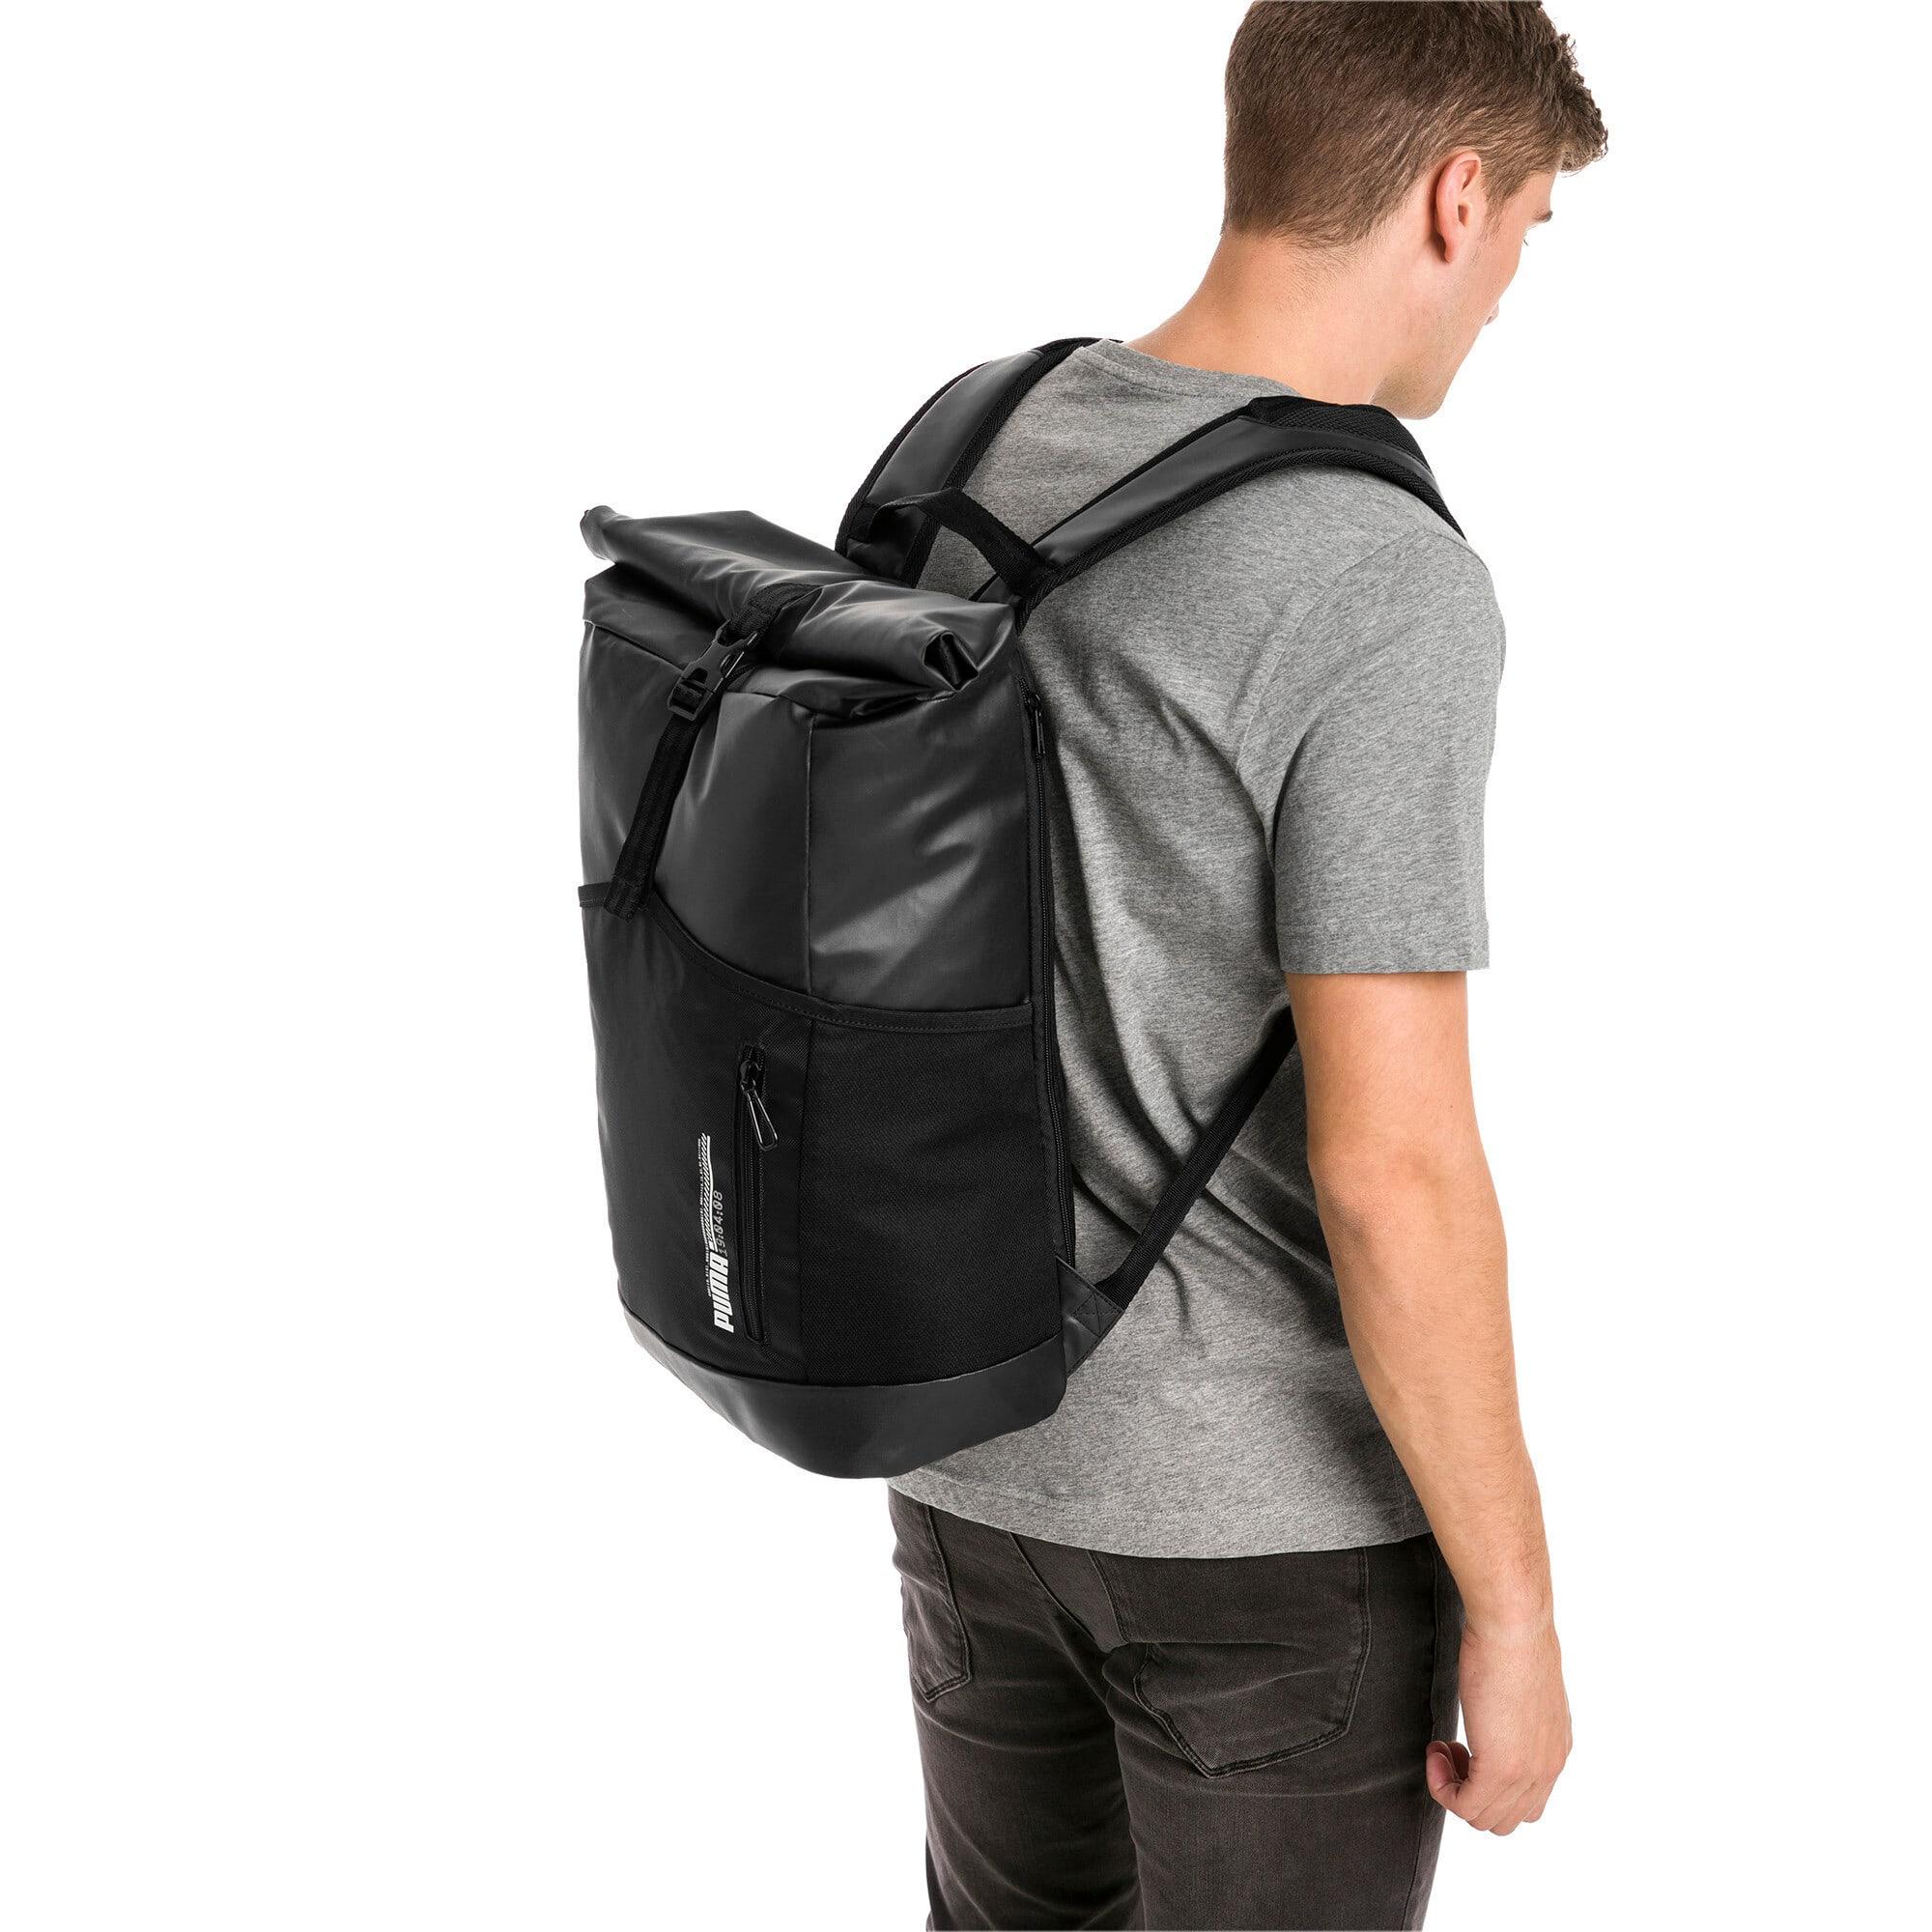 Thumbnail 2 of Energy Rolltop Backpack, Puma Black, medium